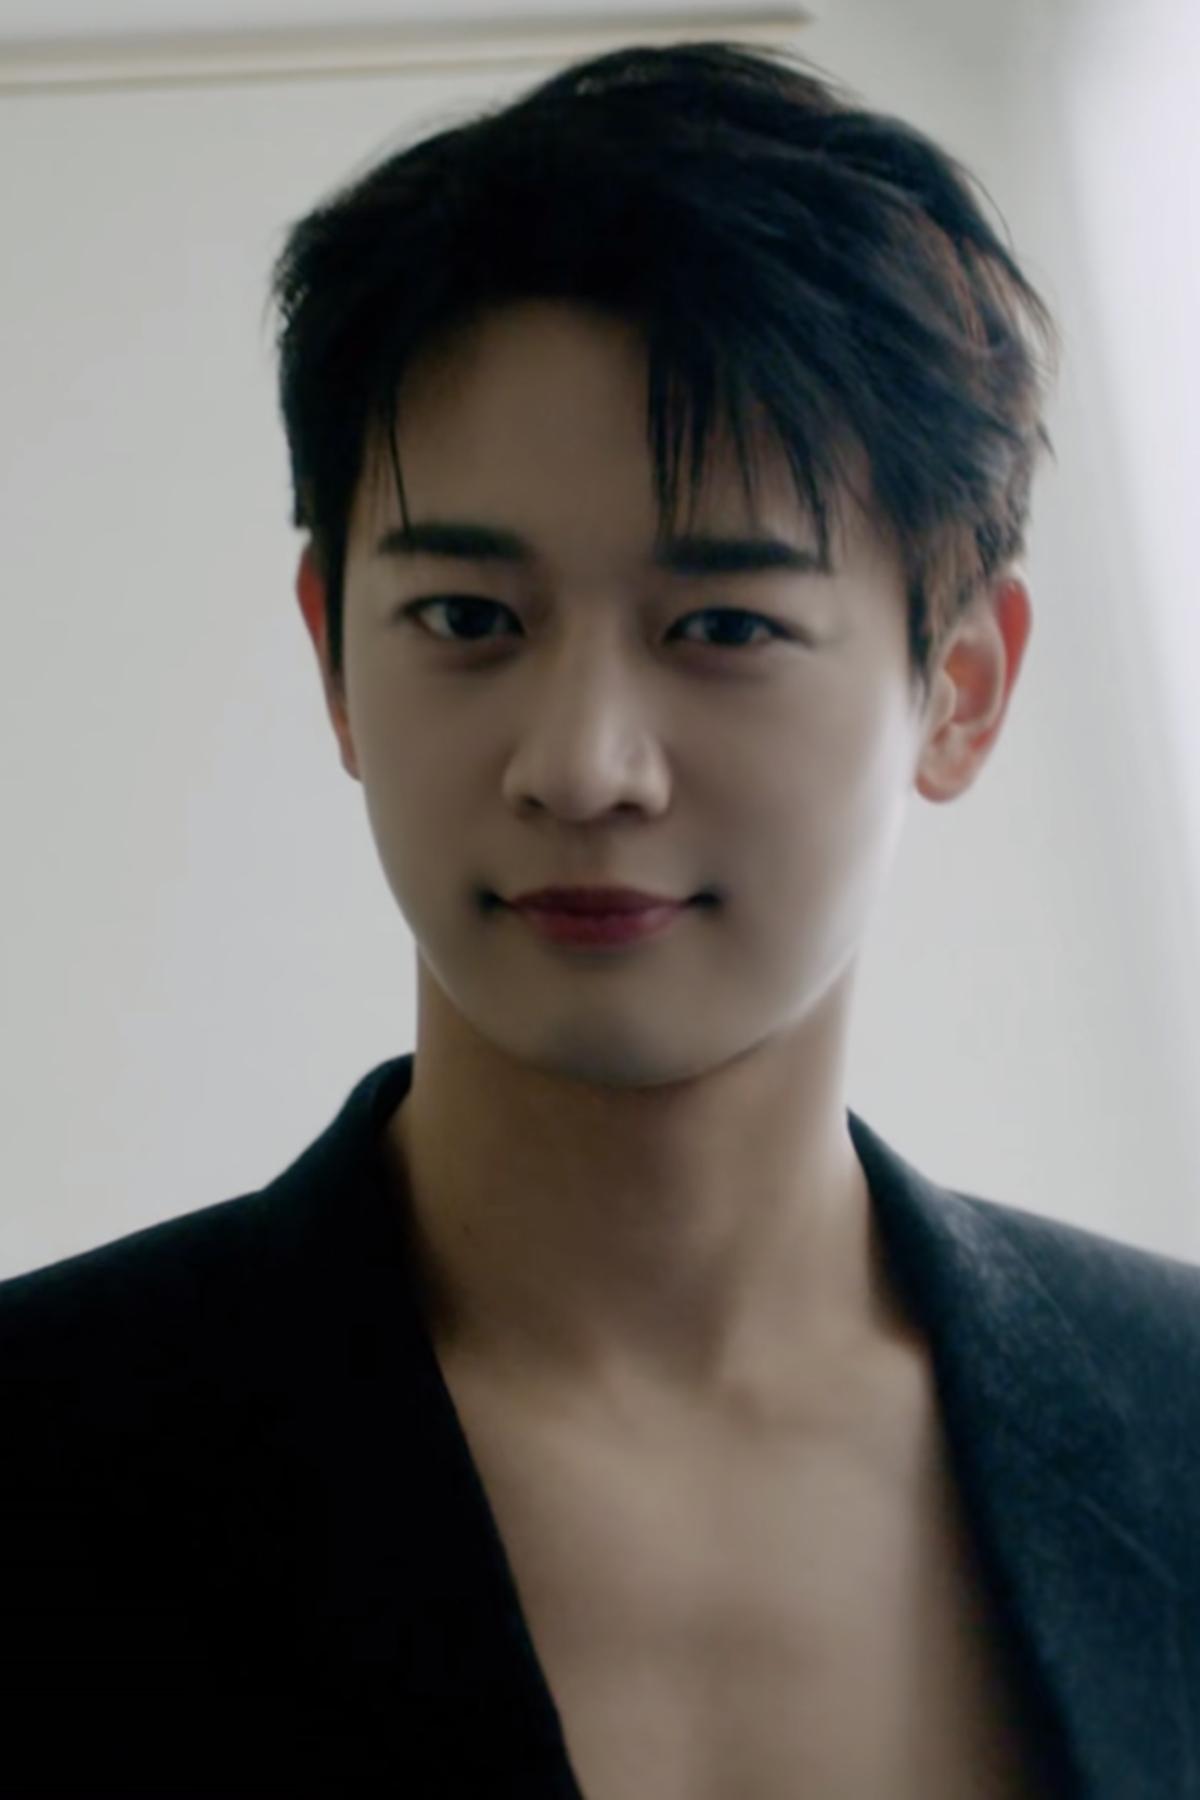 Choi Min-ho - Wikipedia